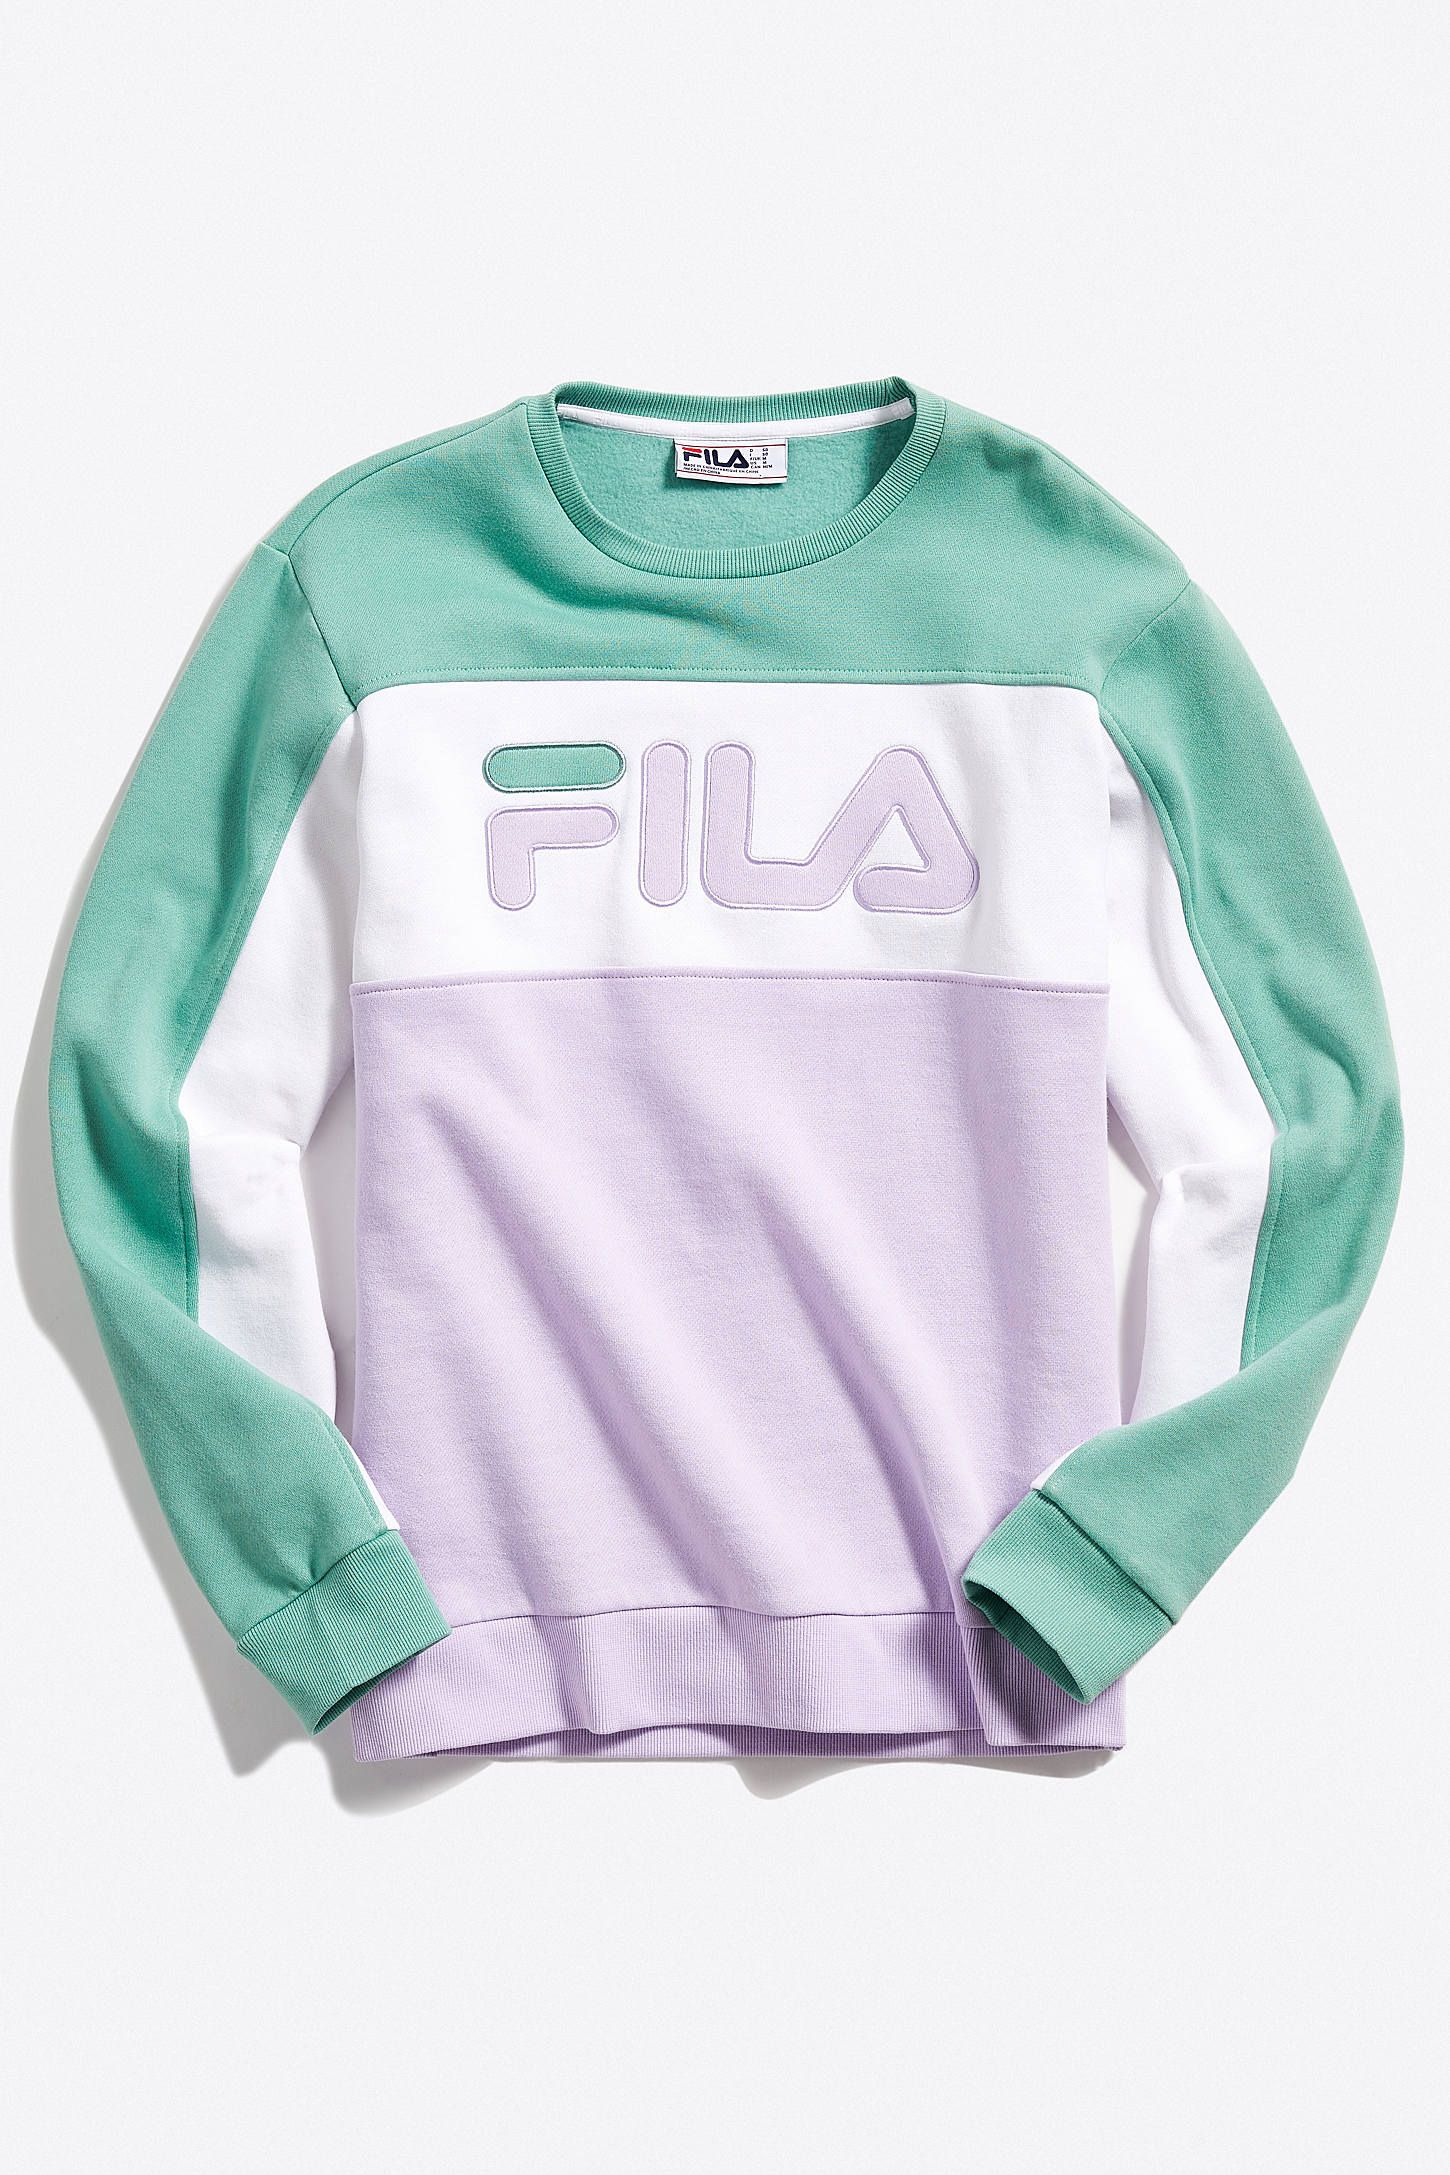 4a7f542c7 FILA Lesner Crew Neck Sweatshirt in 2019 | Sweaters | Crew neck ...